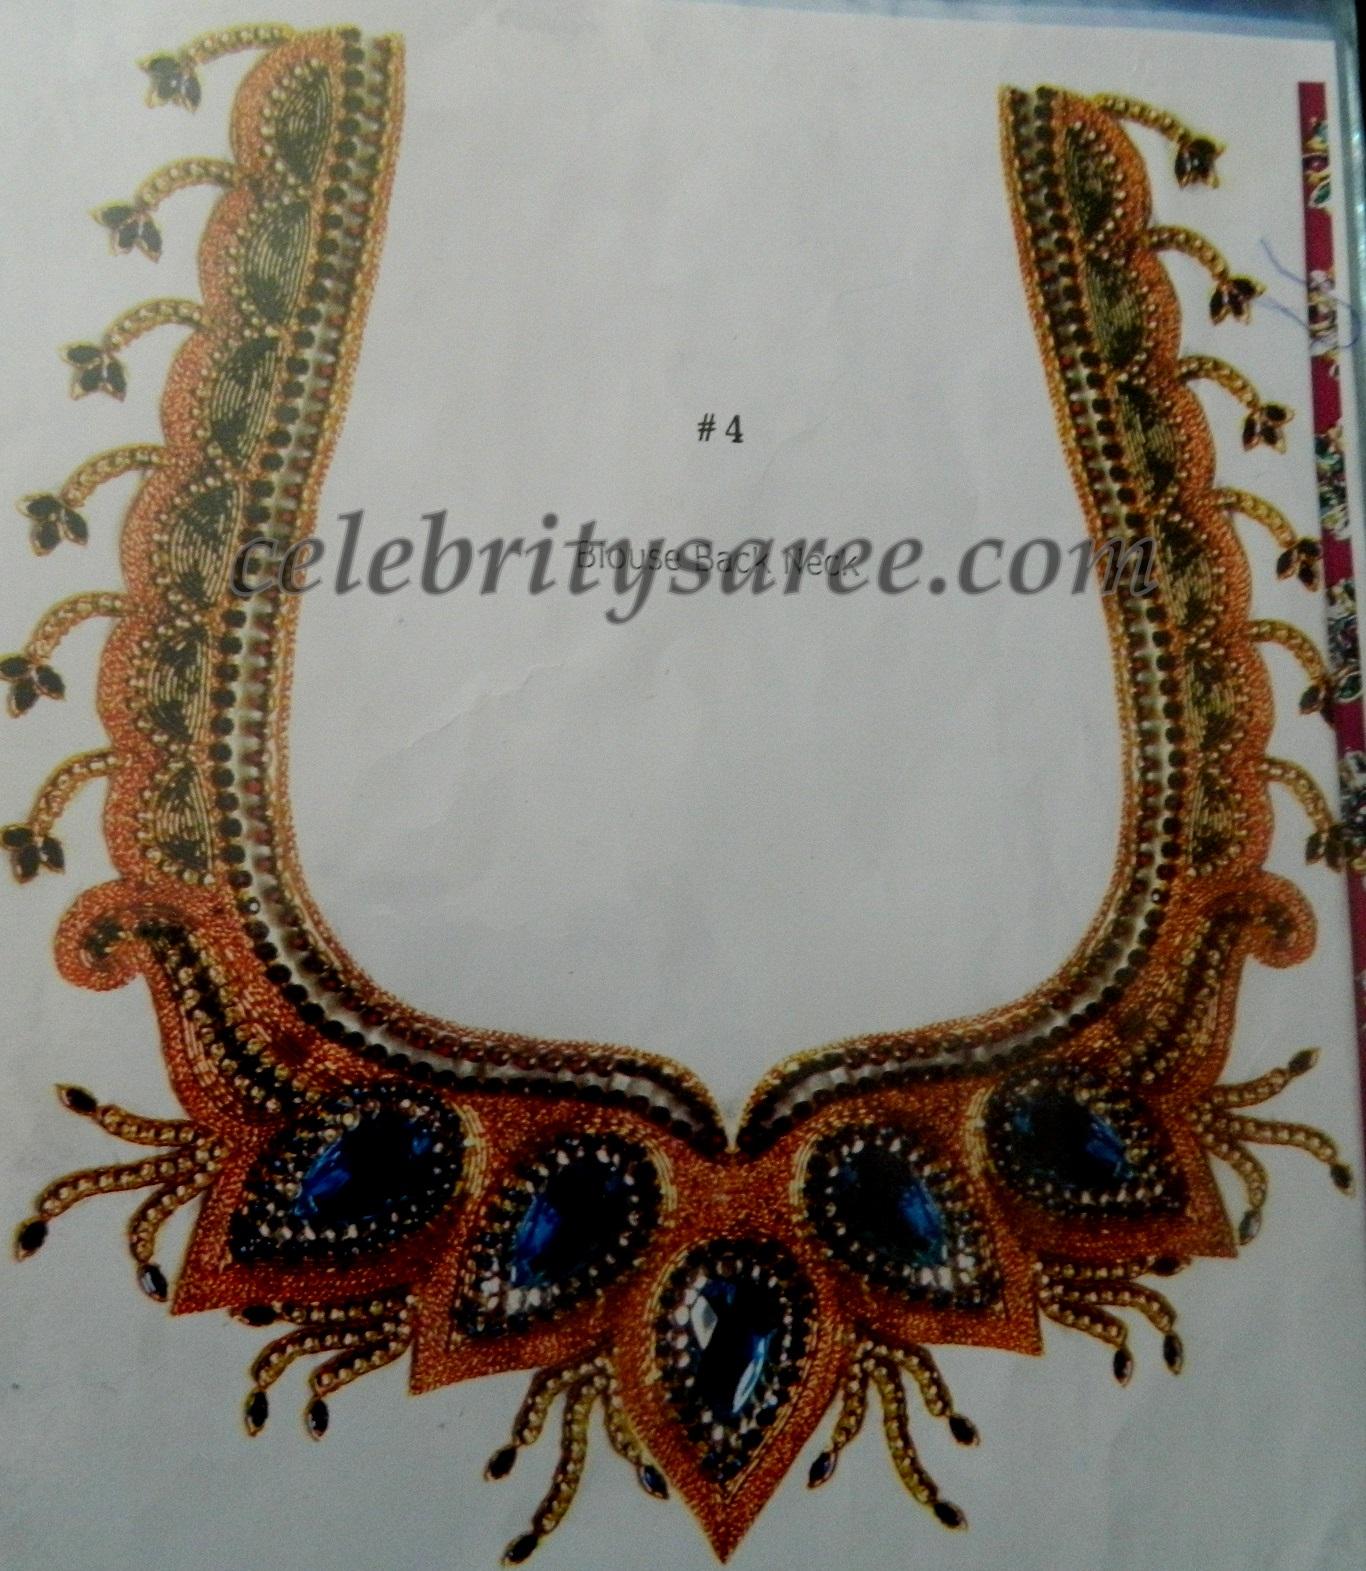 a2692e6854 South Indian Blouse Designs Catalogue « Alzheimer's Network of Oregon